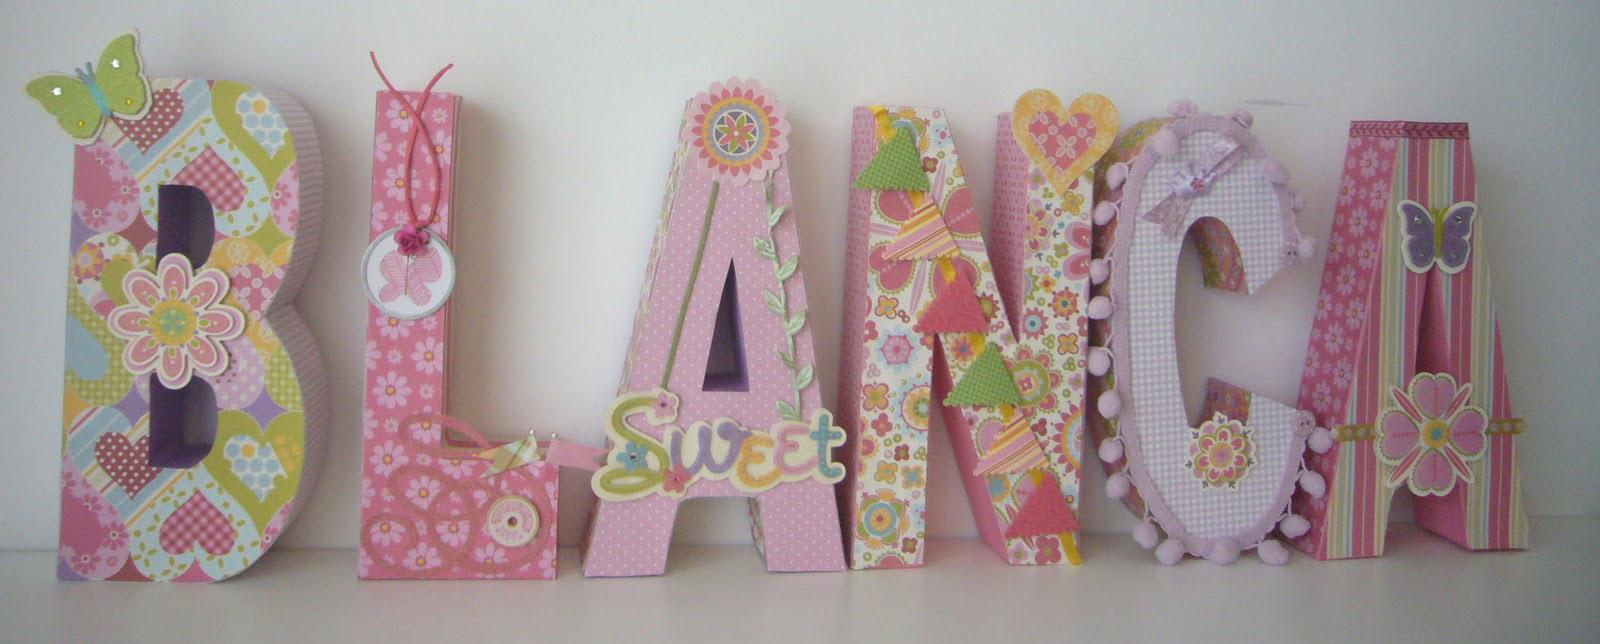 Letras decoradas para eventos - Letras de decoracion ...